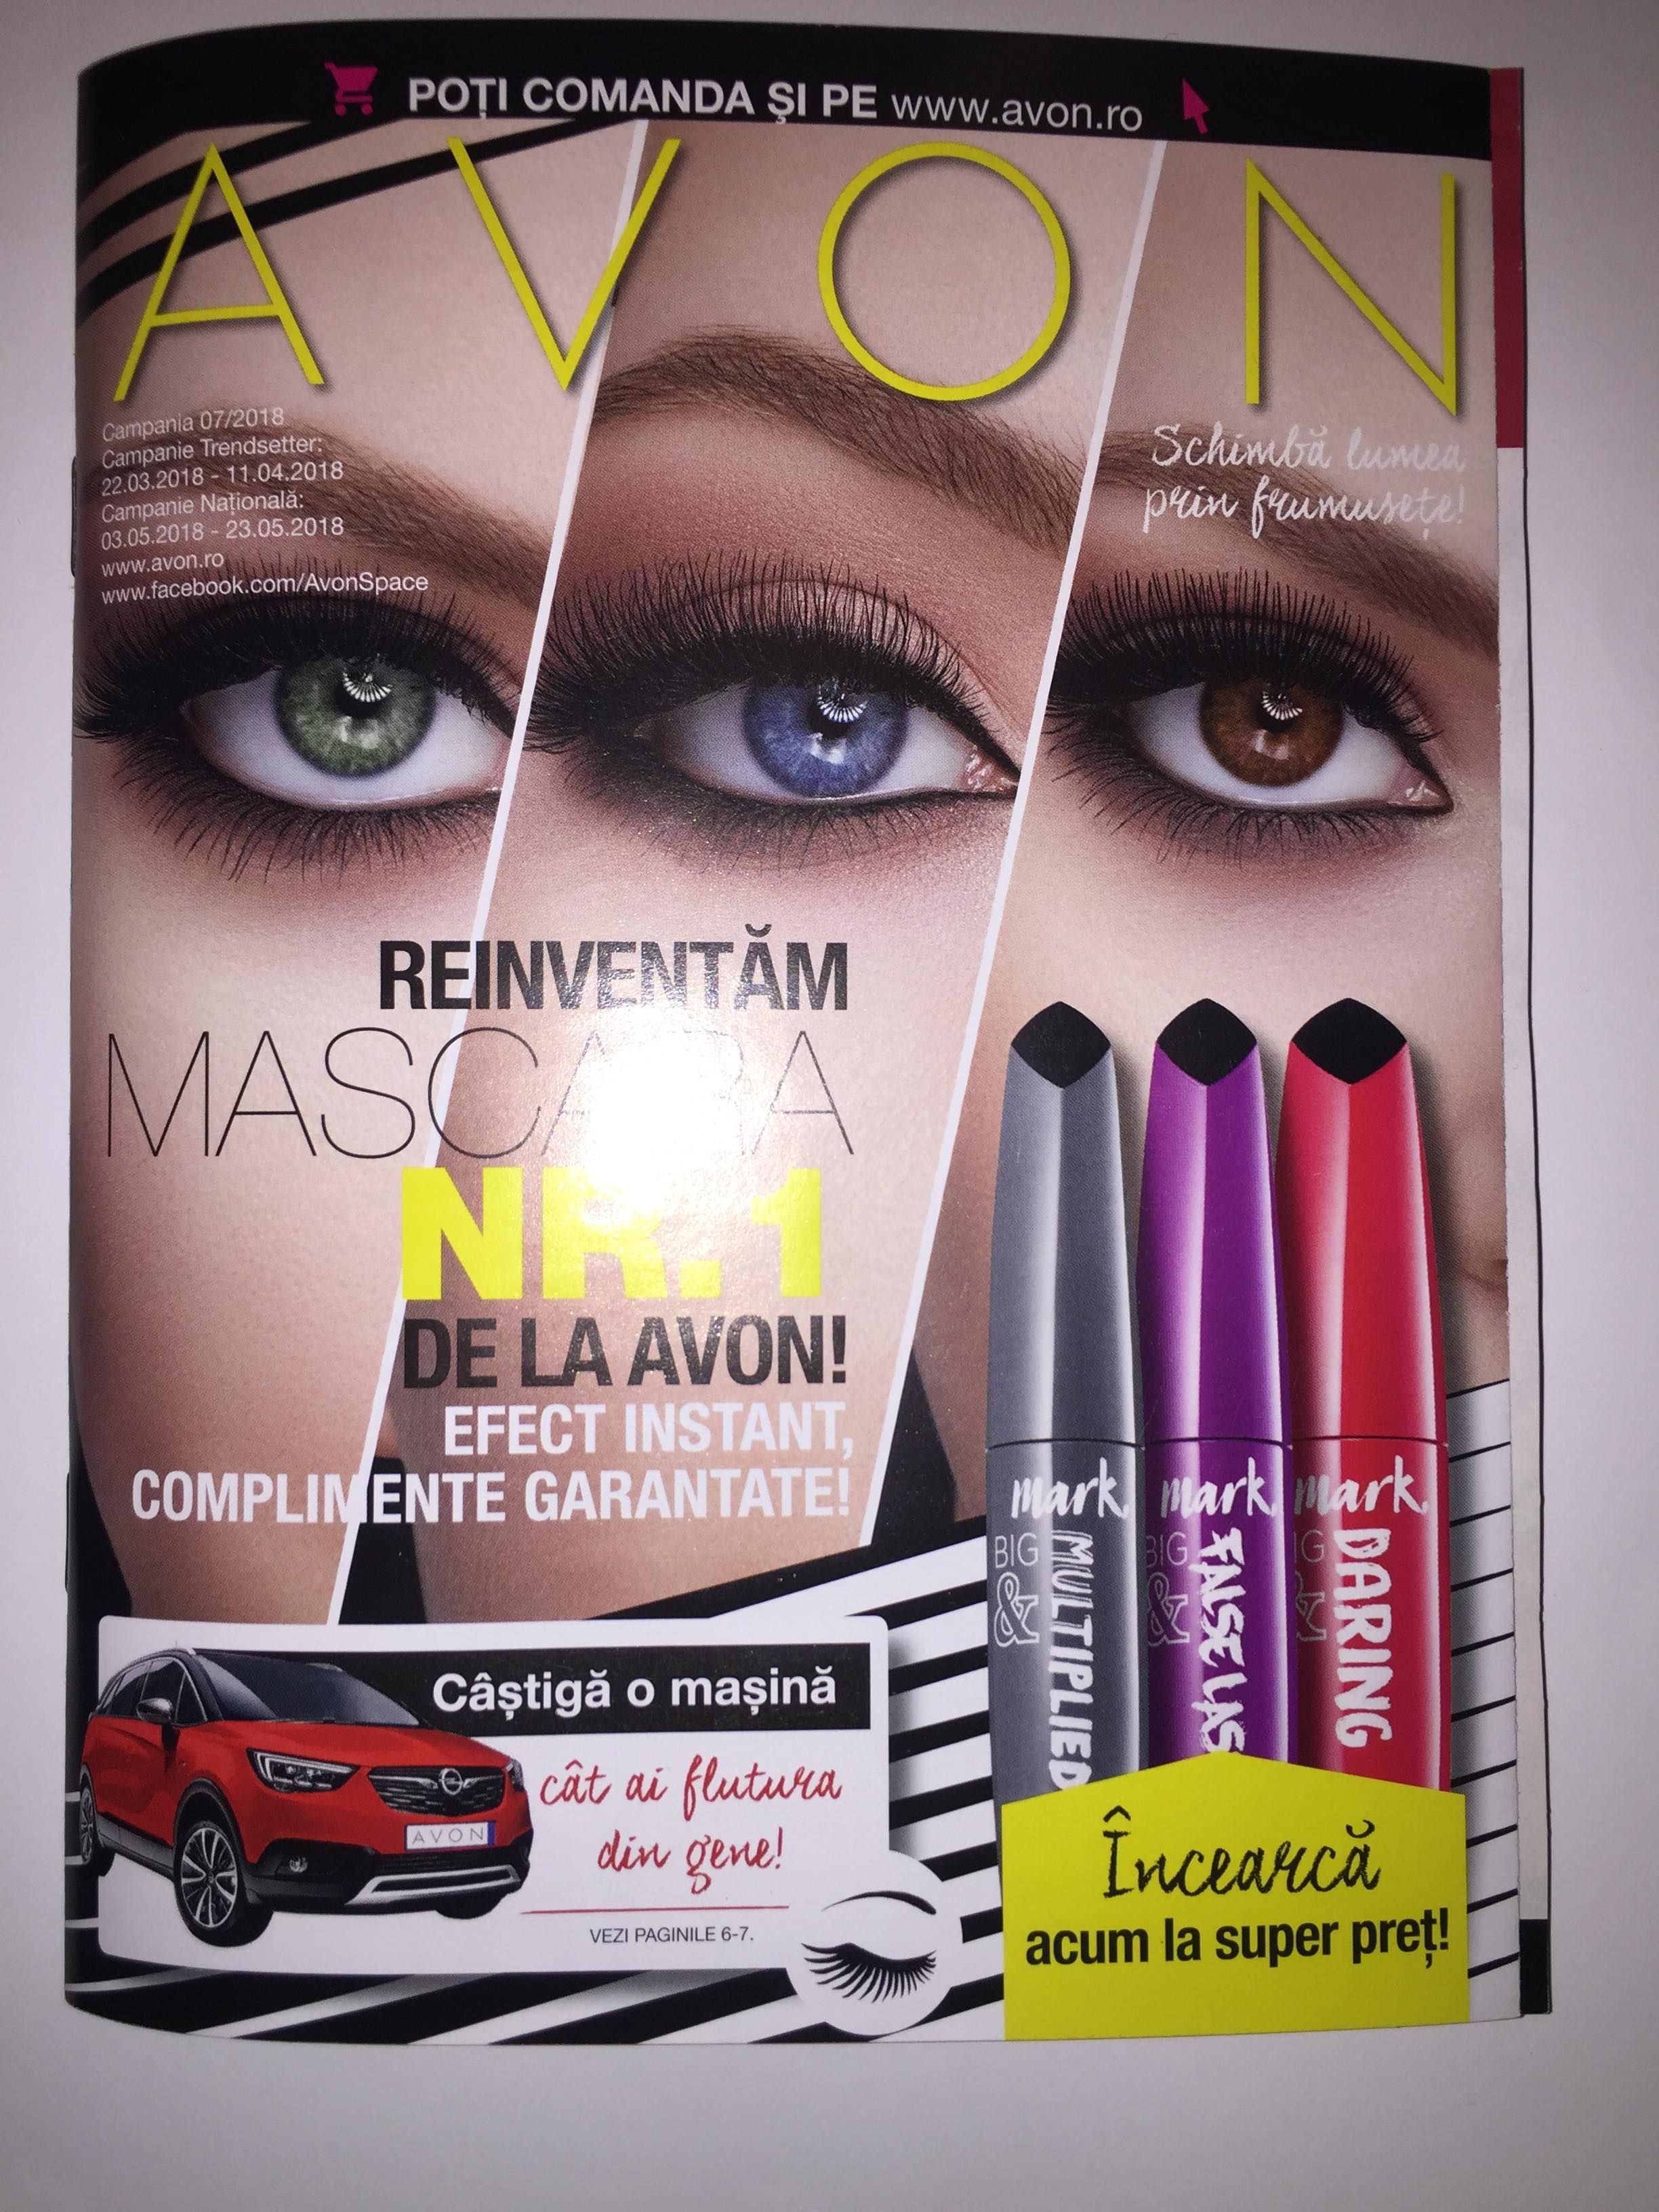 catalogue avon noel 2018 Catalog Avon Campania 7 2018   Brosura Avon C7 | Cosmetice  catalogue avon noel 2018